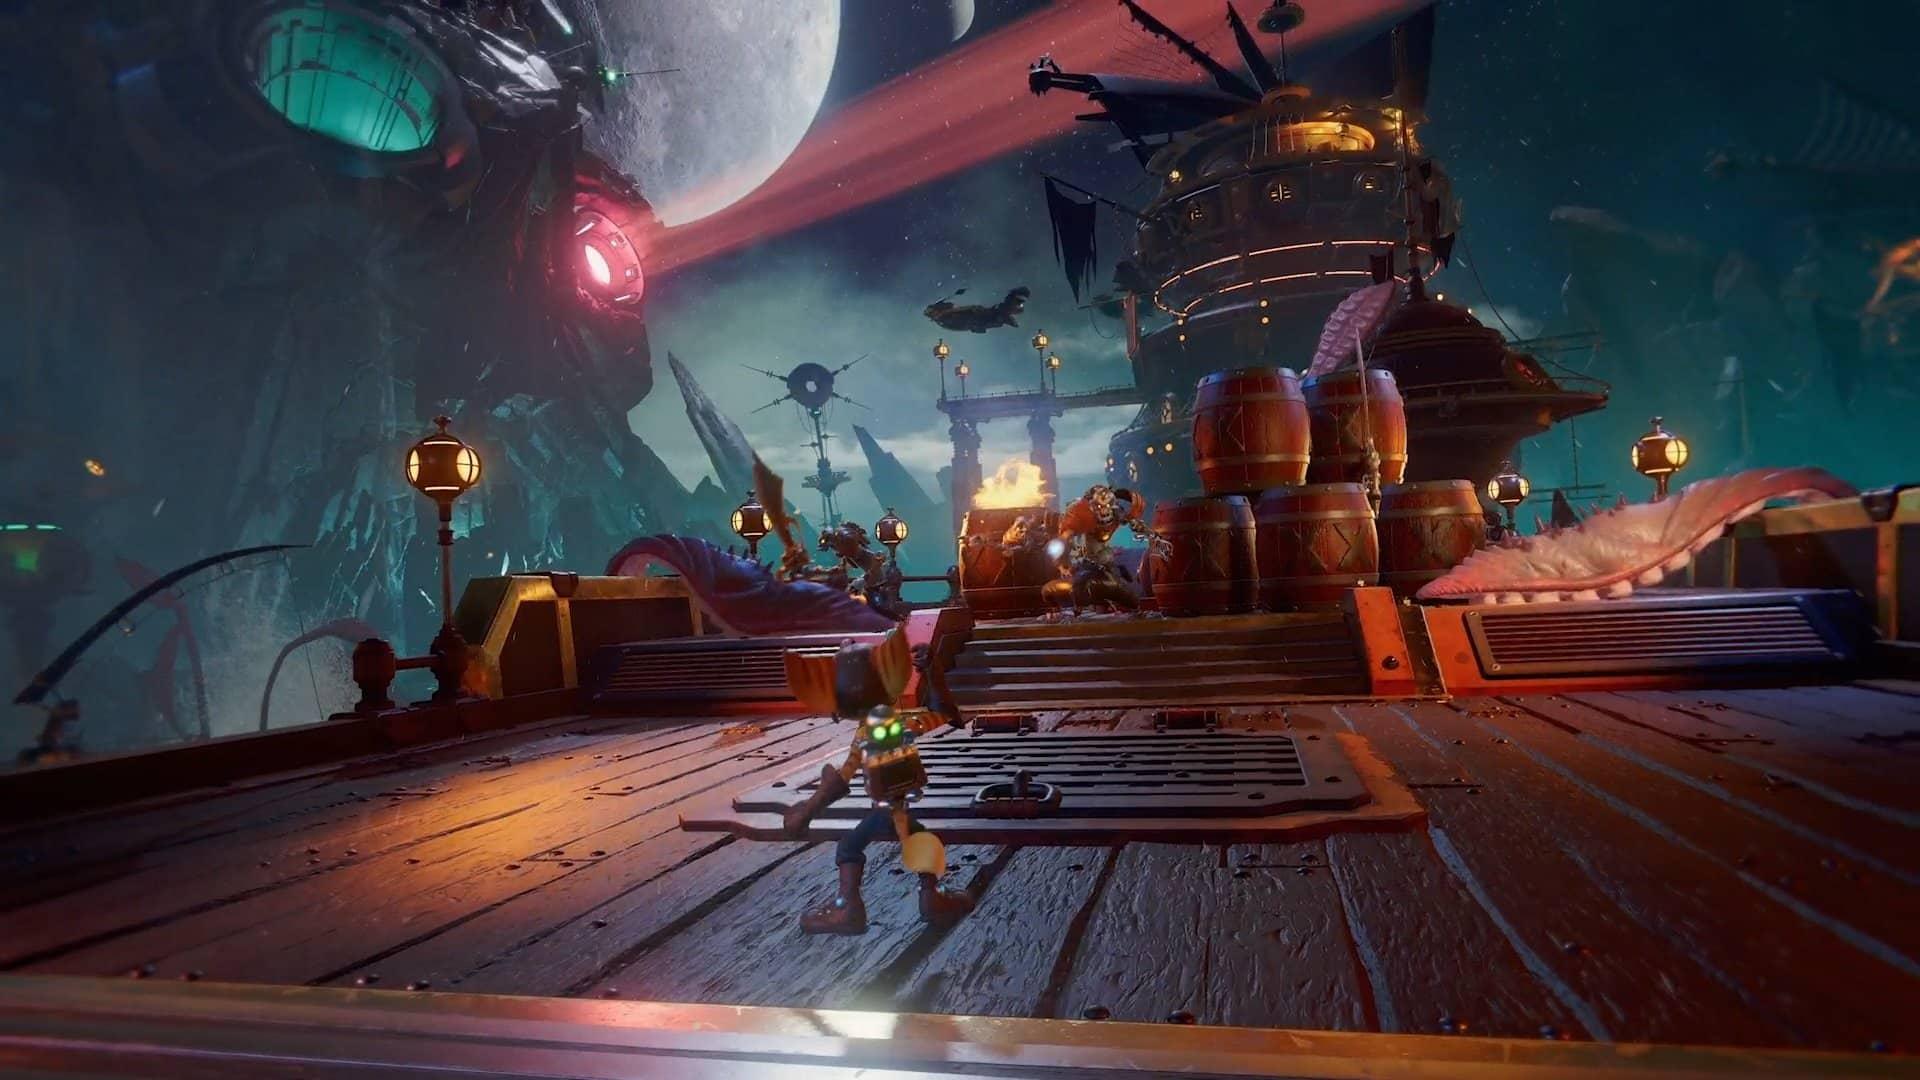 3D platformer revival Crash Bandicoot 4: Its About Time Ratchet & Clank The Gunk Balan Wonderworld Psychonauts 2 Yooka-Laylee A Hat in Time